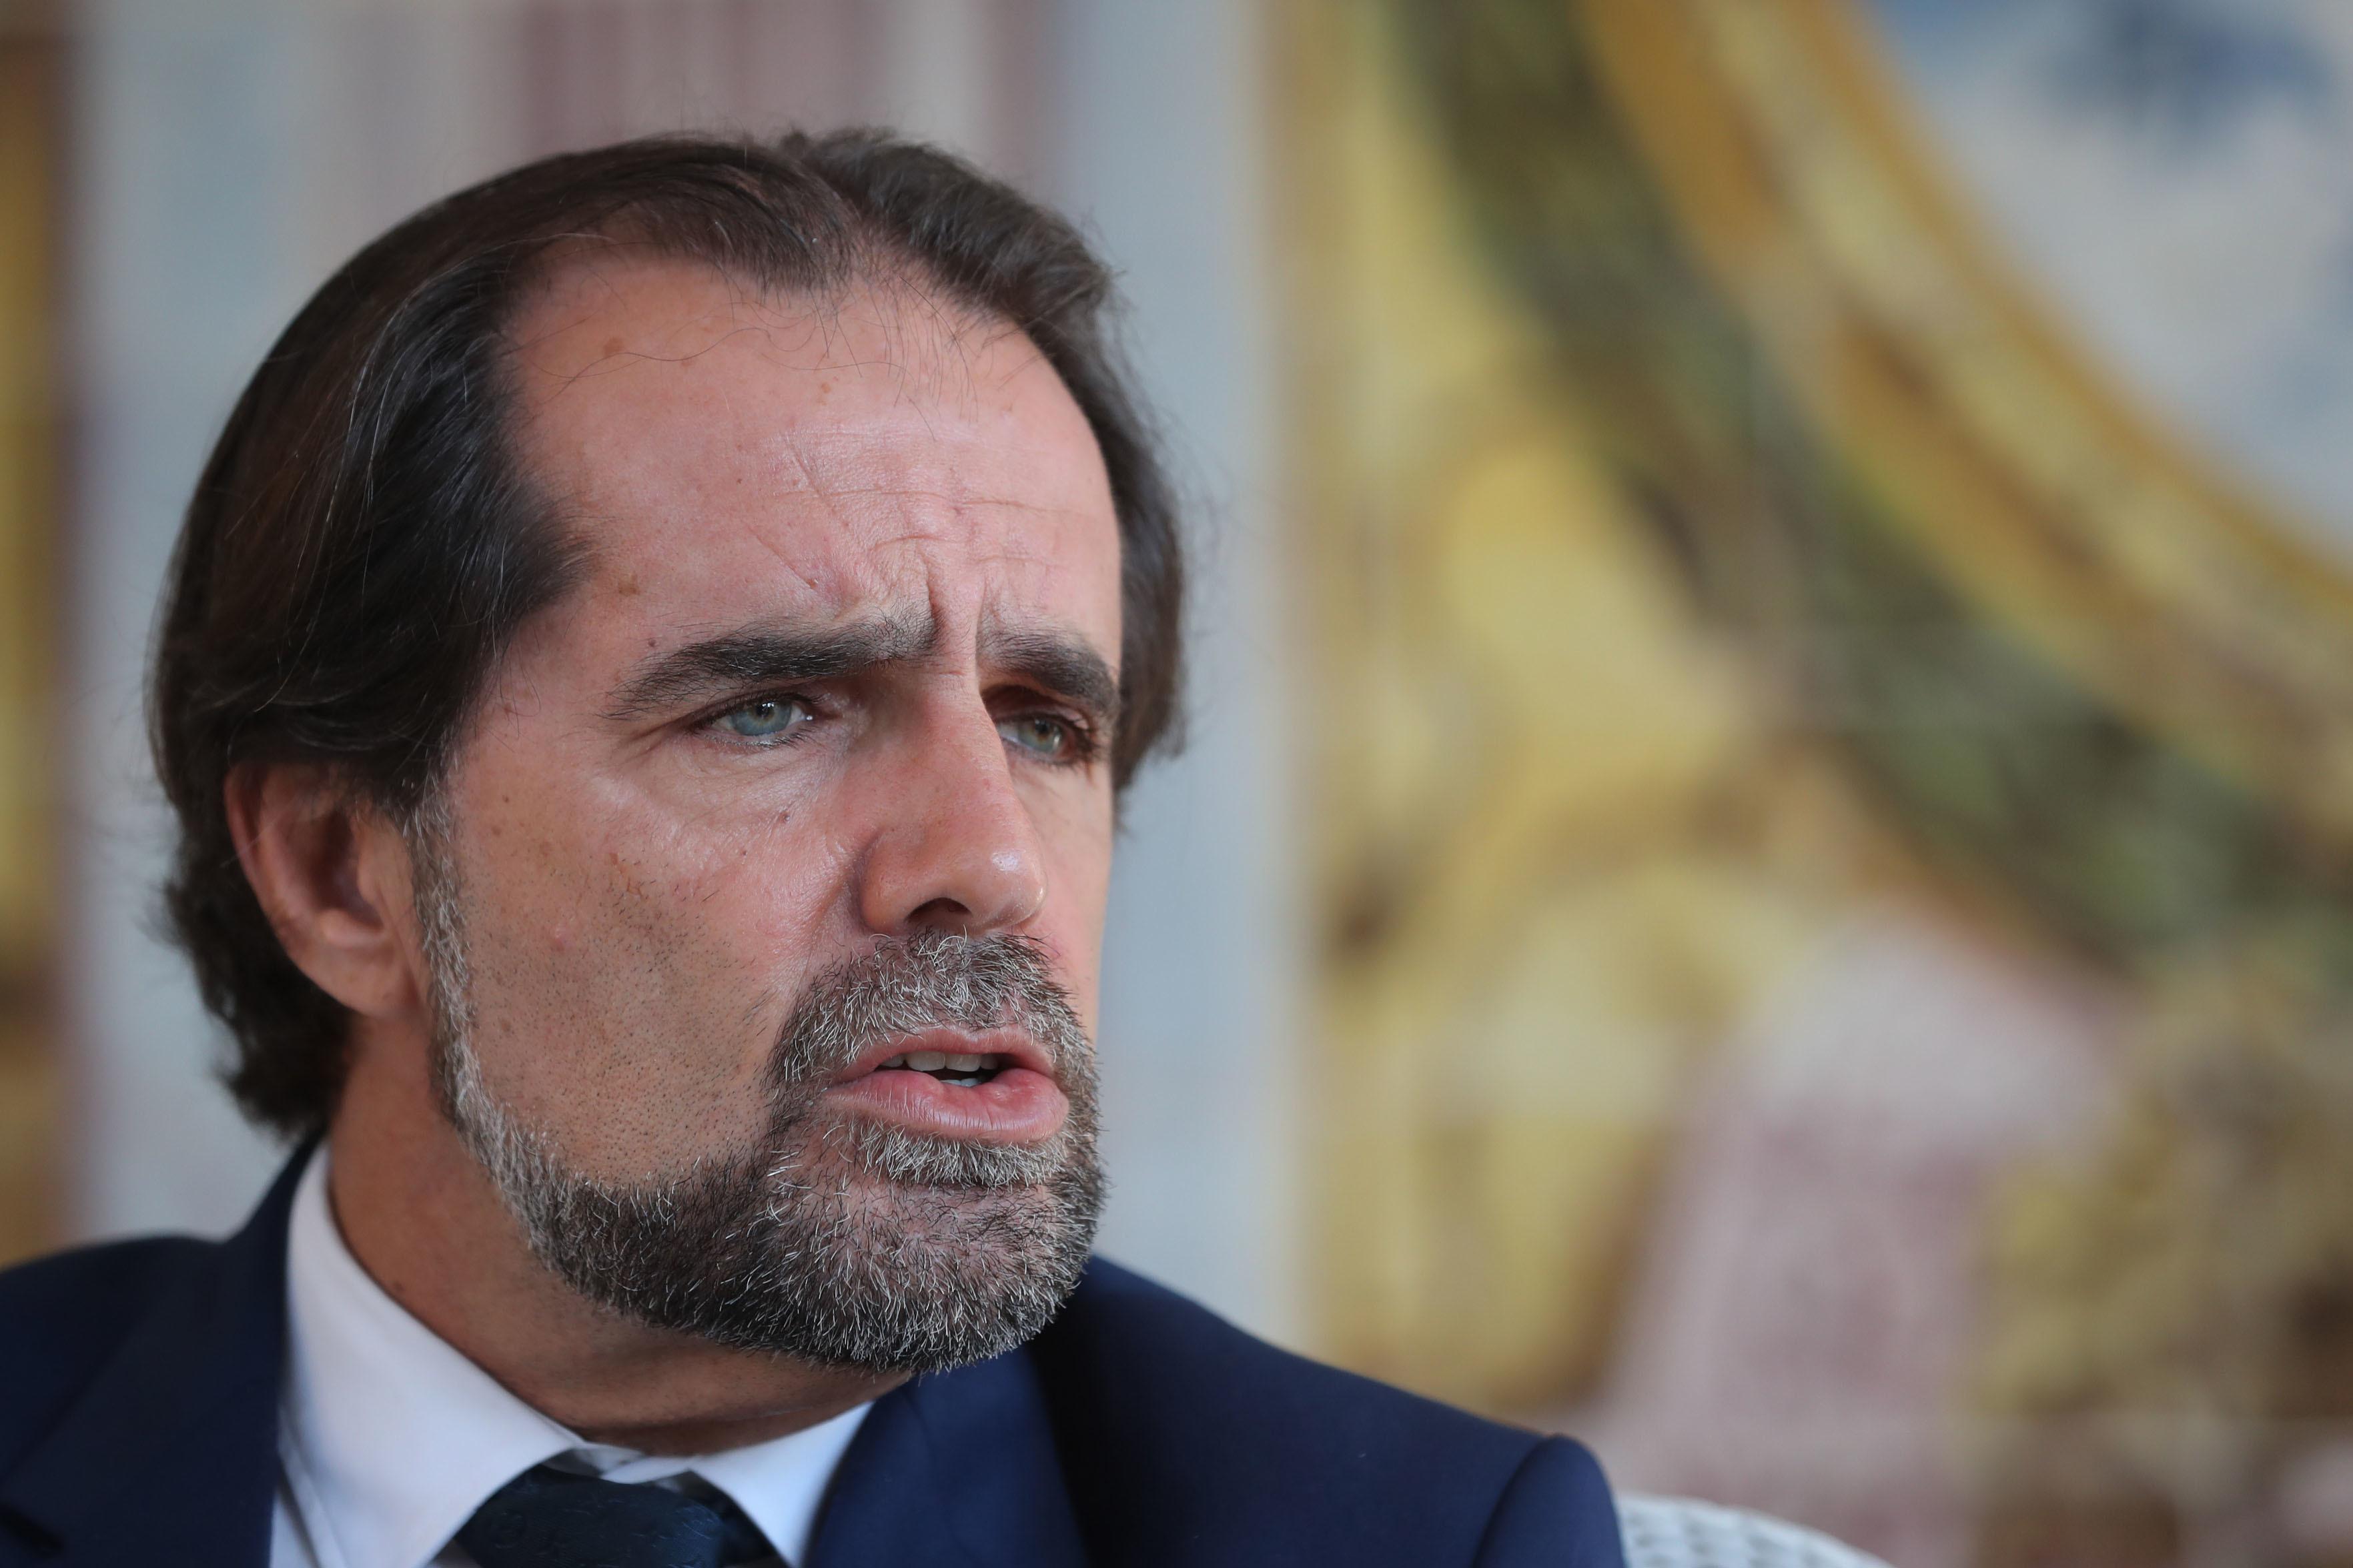 "Albuquerque confirma ciclo de diálogo após PS ter deixado de ""tentar prejudicar"" Madeira"